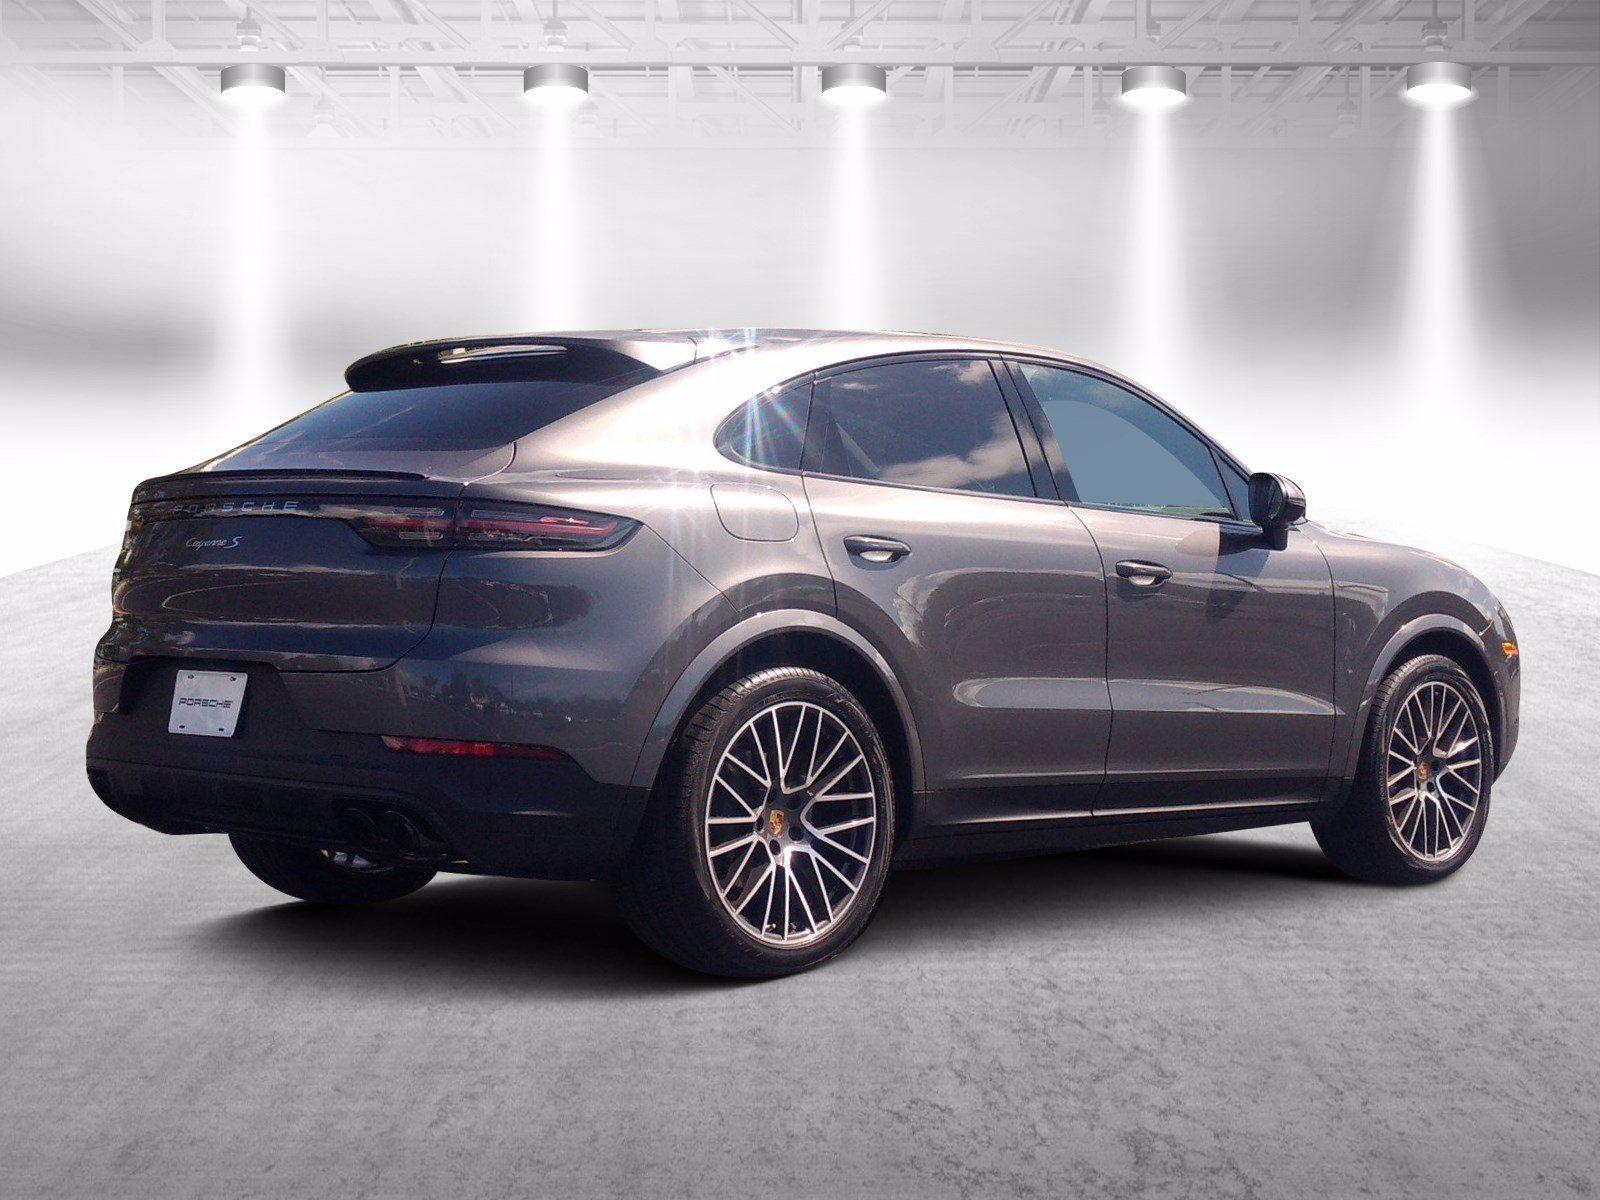 2021 Porsche Cayenne S Coupe – 4